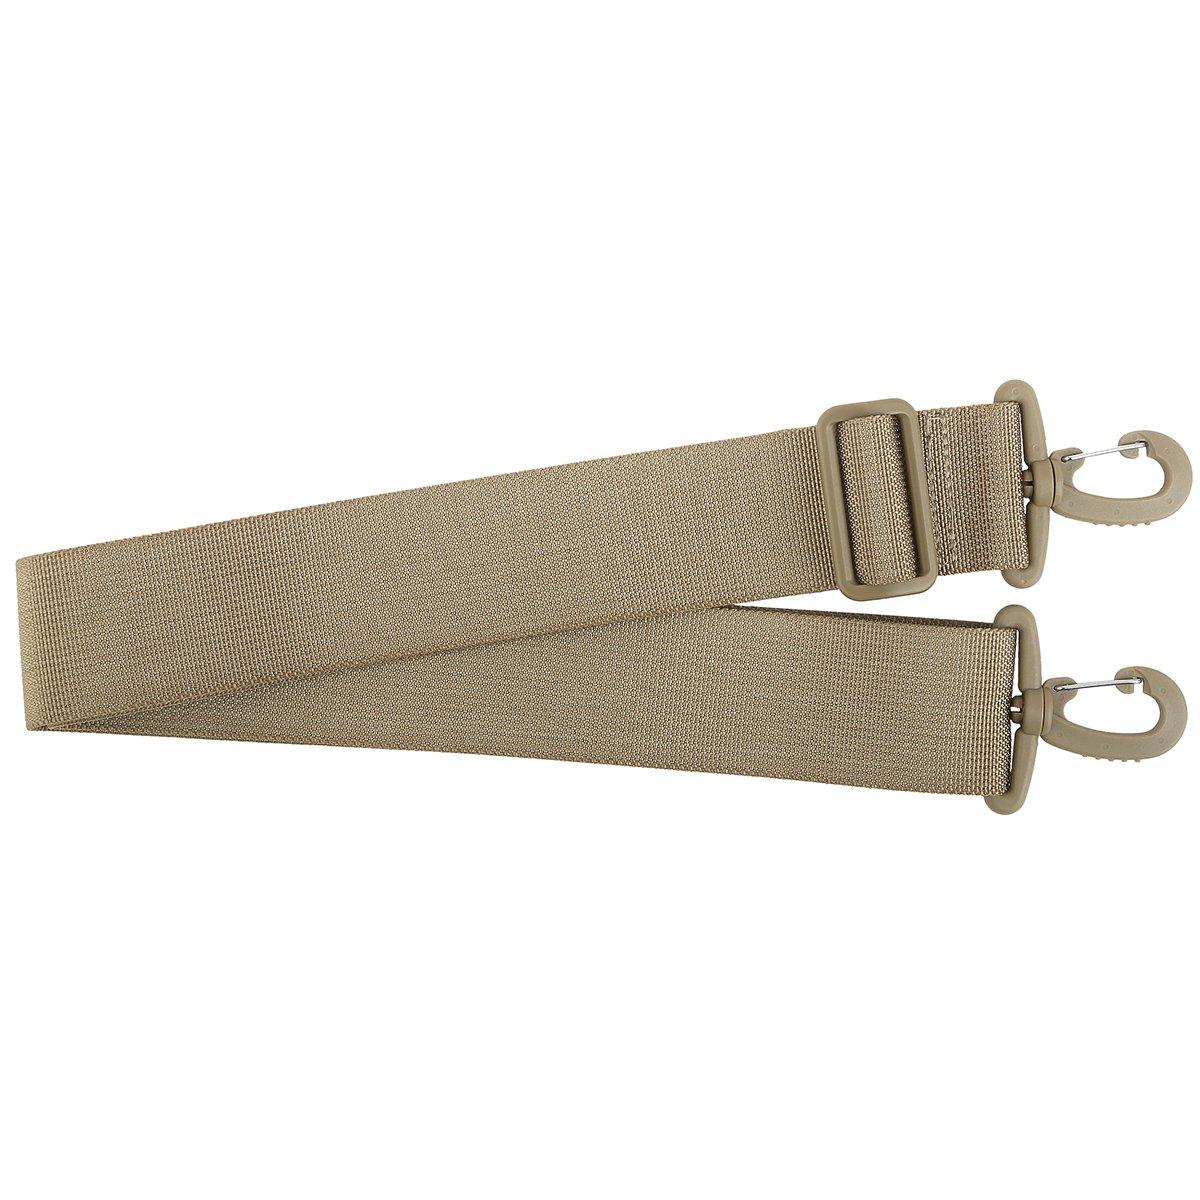 2″ Shoulder Strap – Khaki